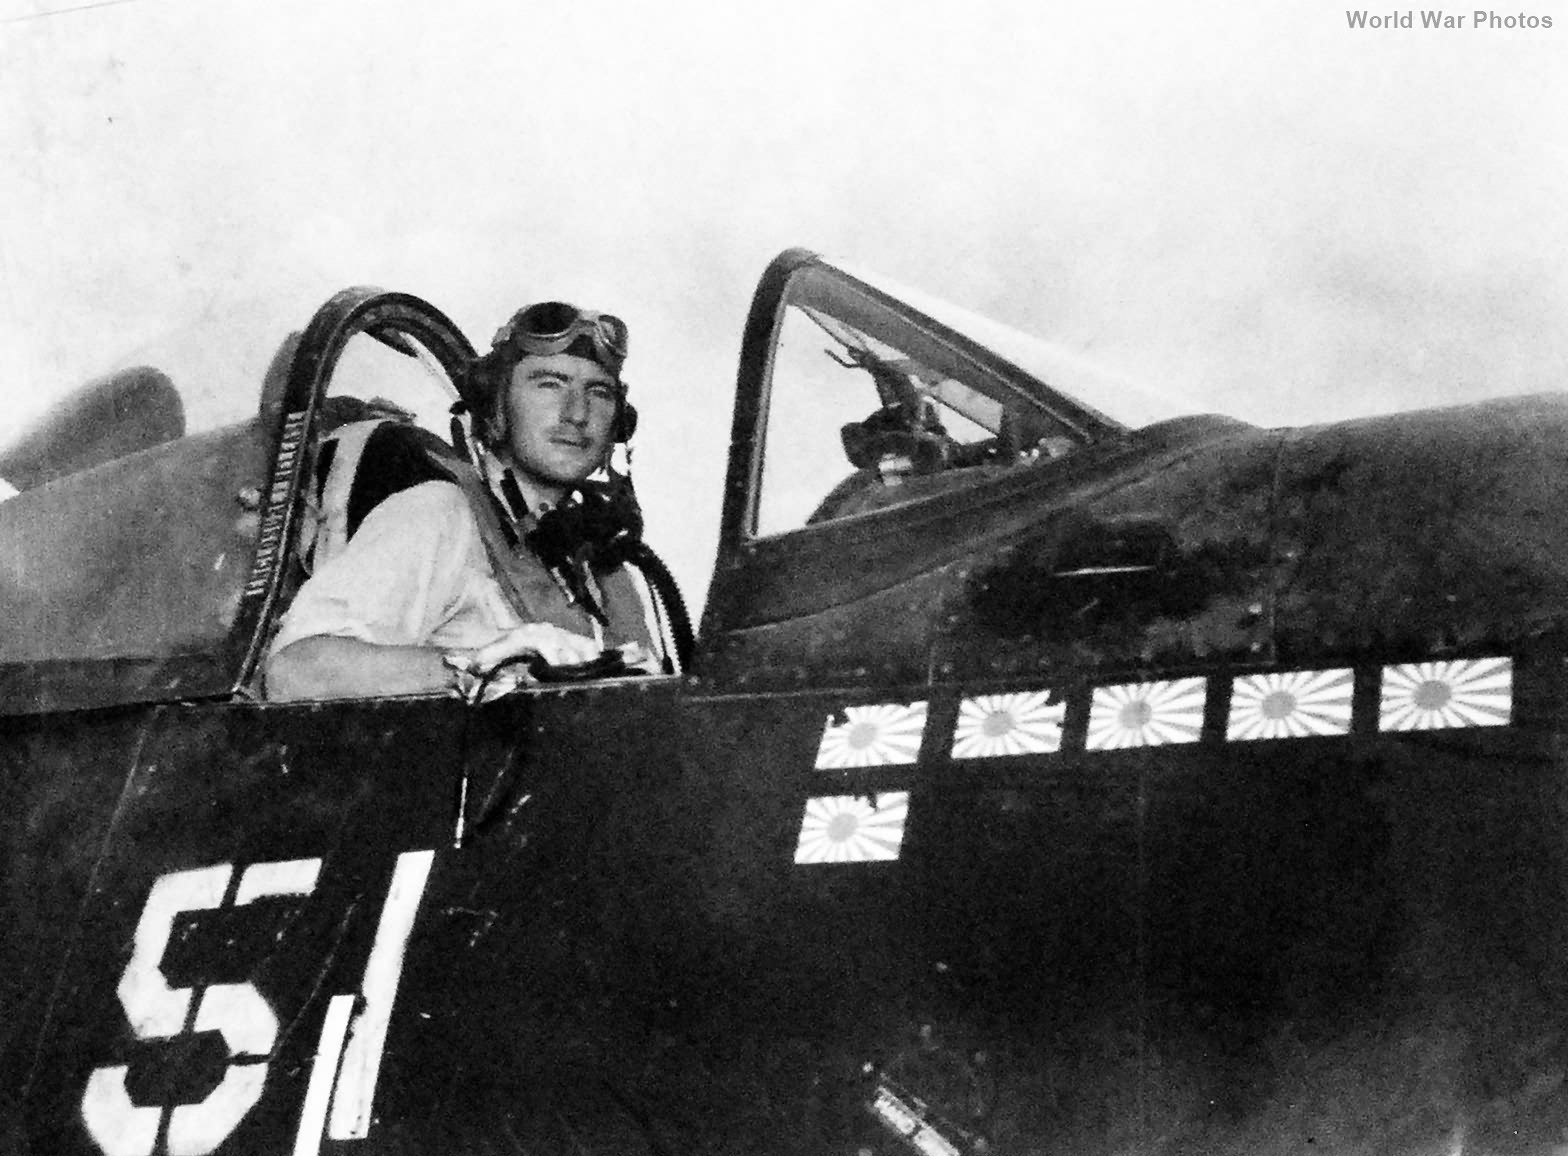 VMF-323 pilot Lt Wade in cockpit of a F4U May 1945